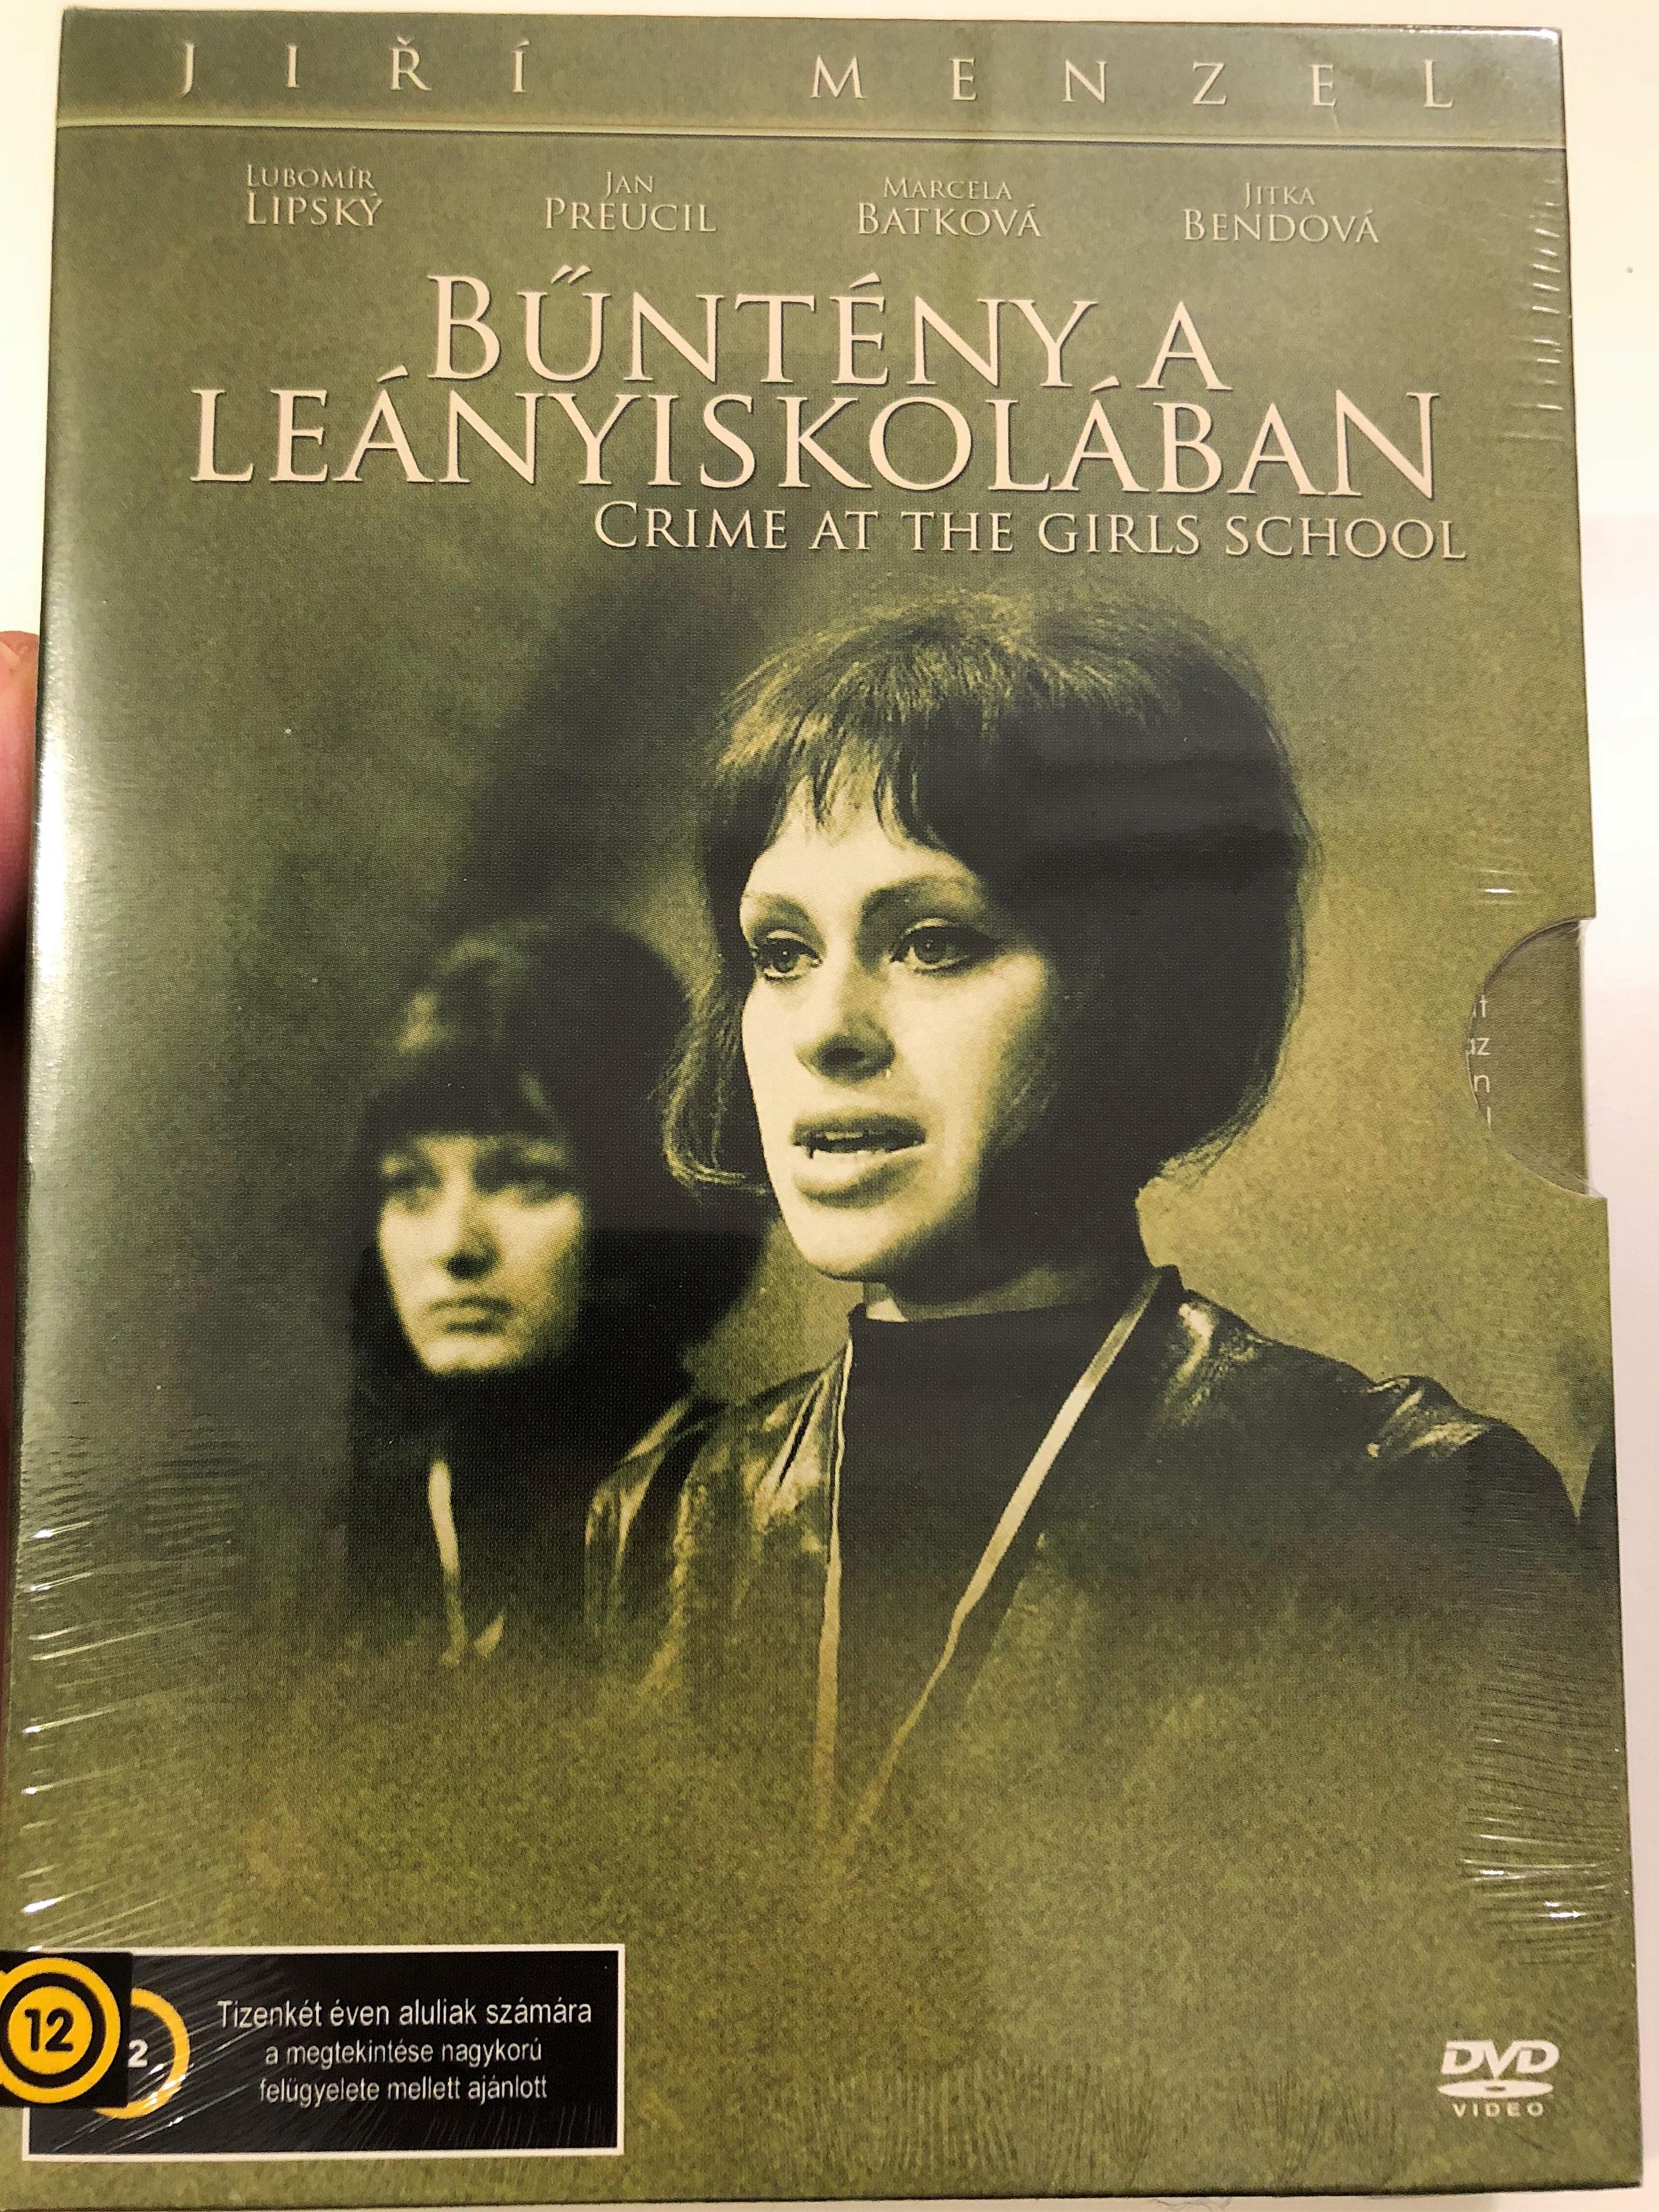 crime-at-the-girls-school-zlo-in-v-d-v-kole-dvd-1968-b-nt-ny-a-le-nyiskol-ban-directed-by-ji-menzel-starring-lubom-r-lipsky-jan-preucil-marcela-batkov-jitka-bendov-1-.jpg